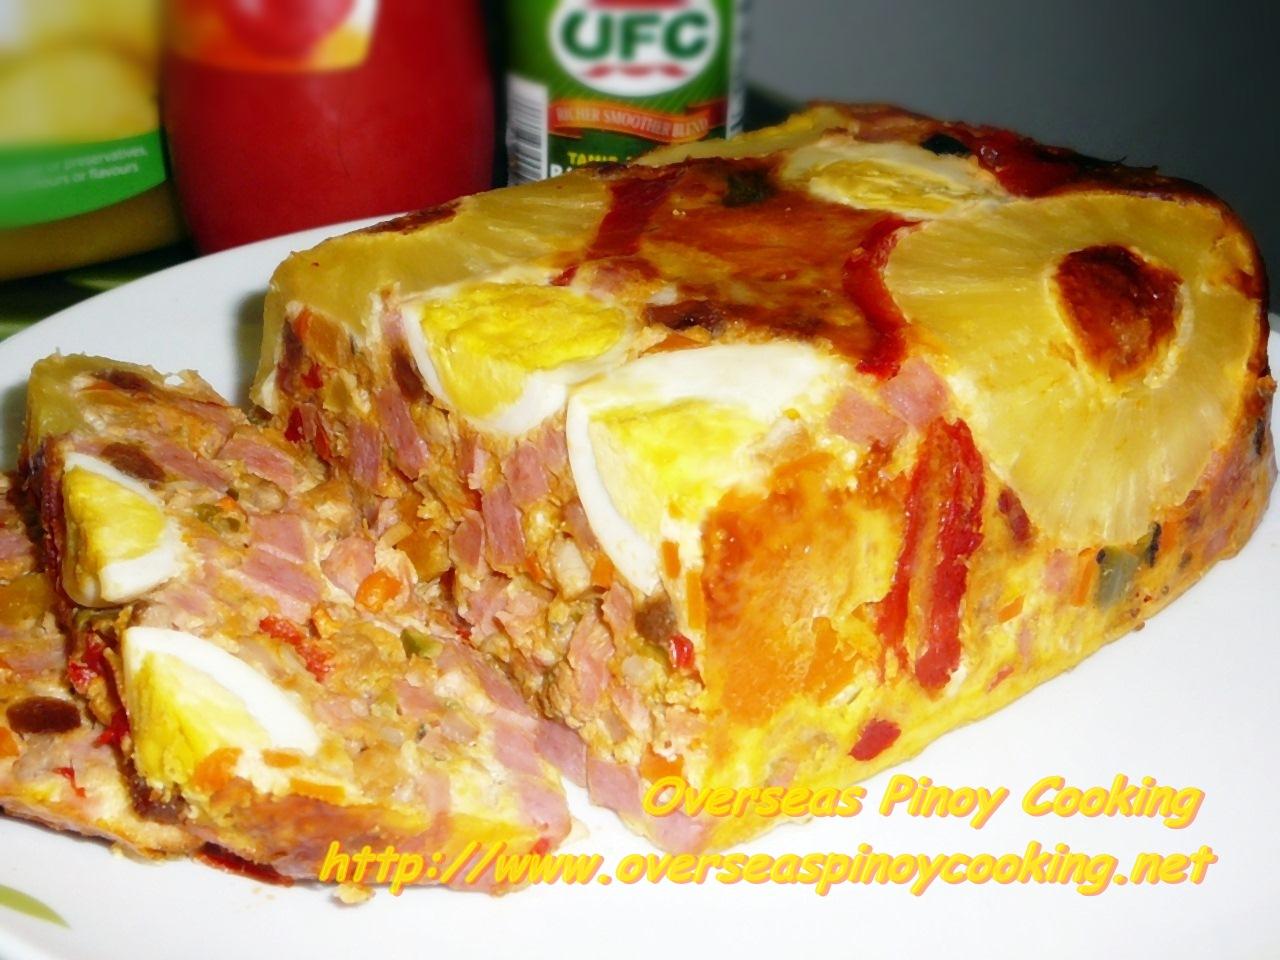 Overseas Pinoy Cooking Christmas Hardinera Lucban